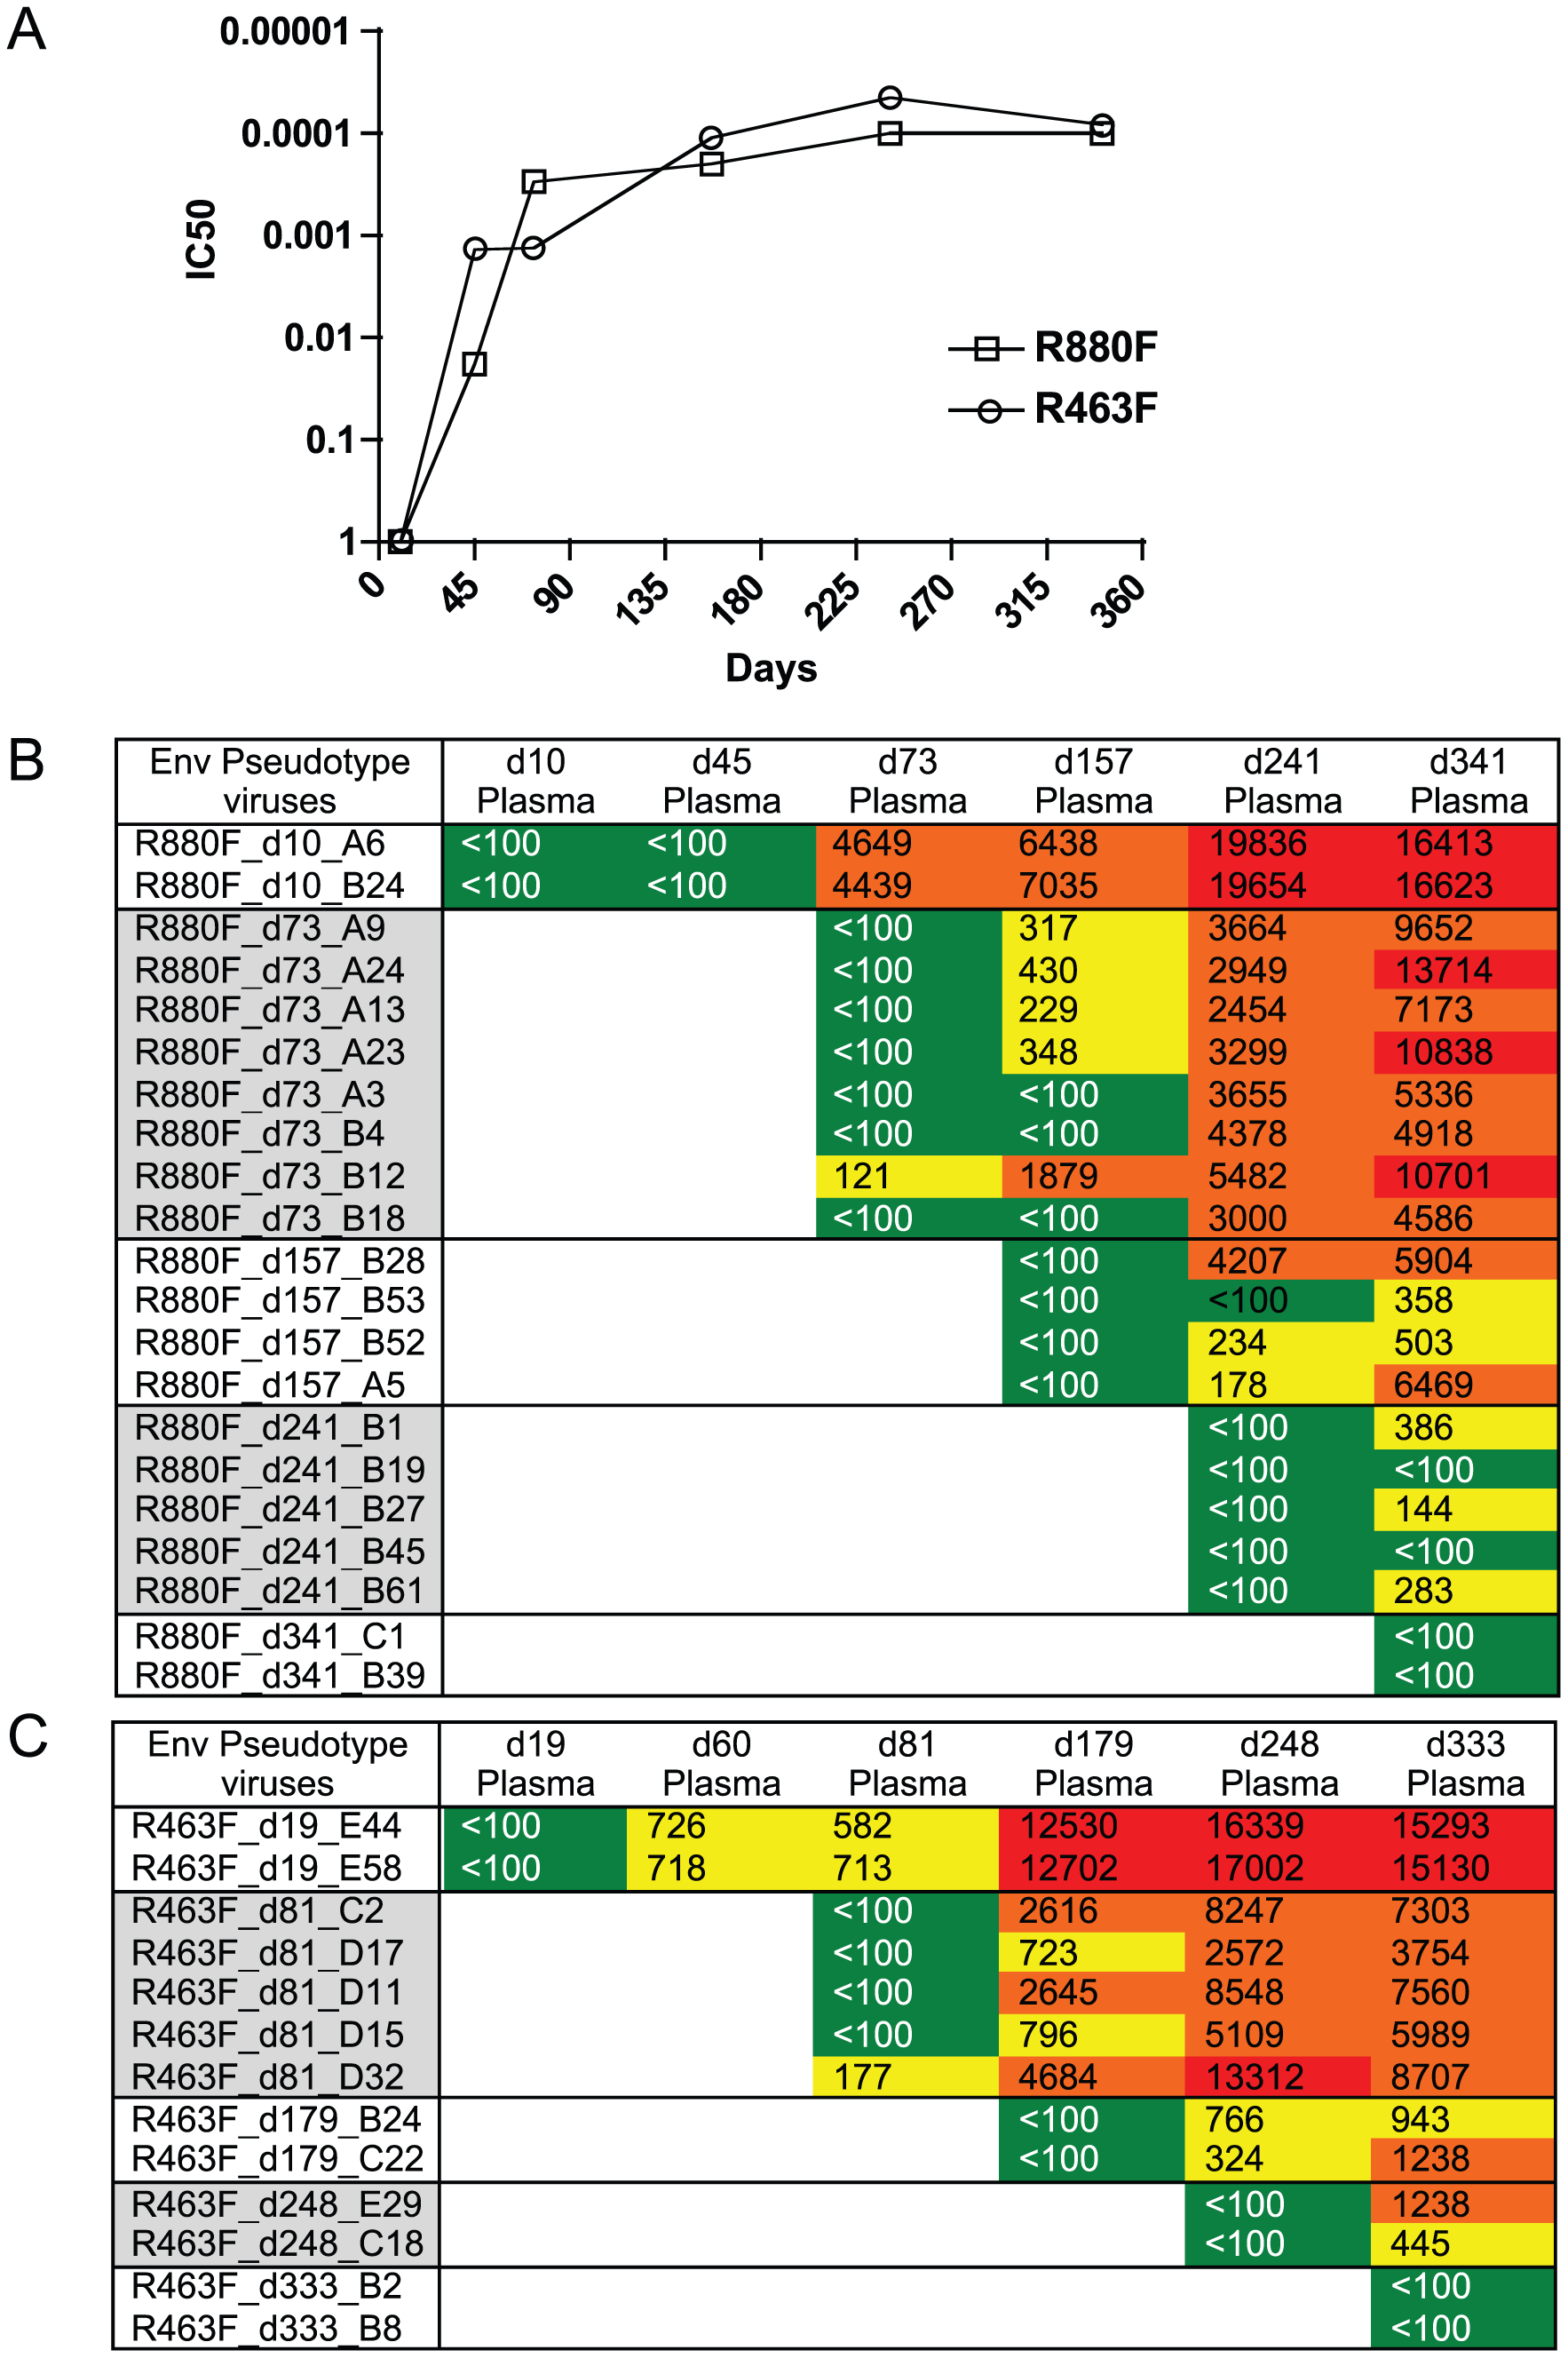 Longitudinal autologous neutralizing antibody IC50 titer during the first year of infection.